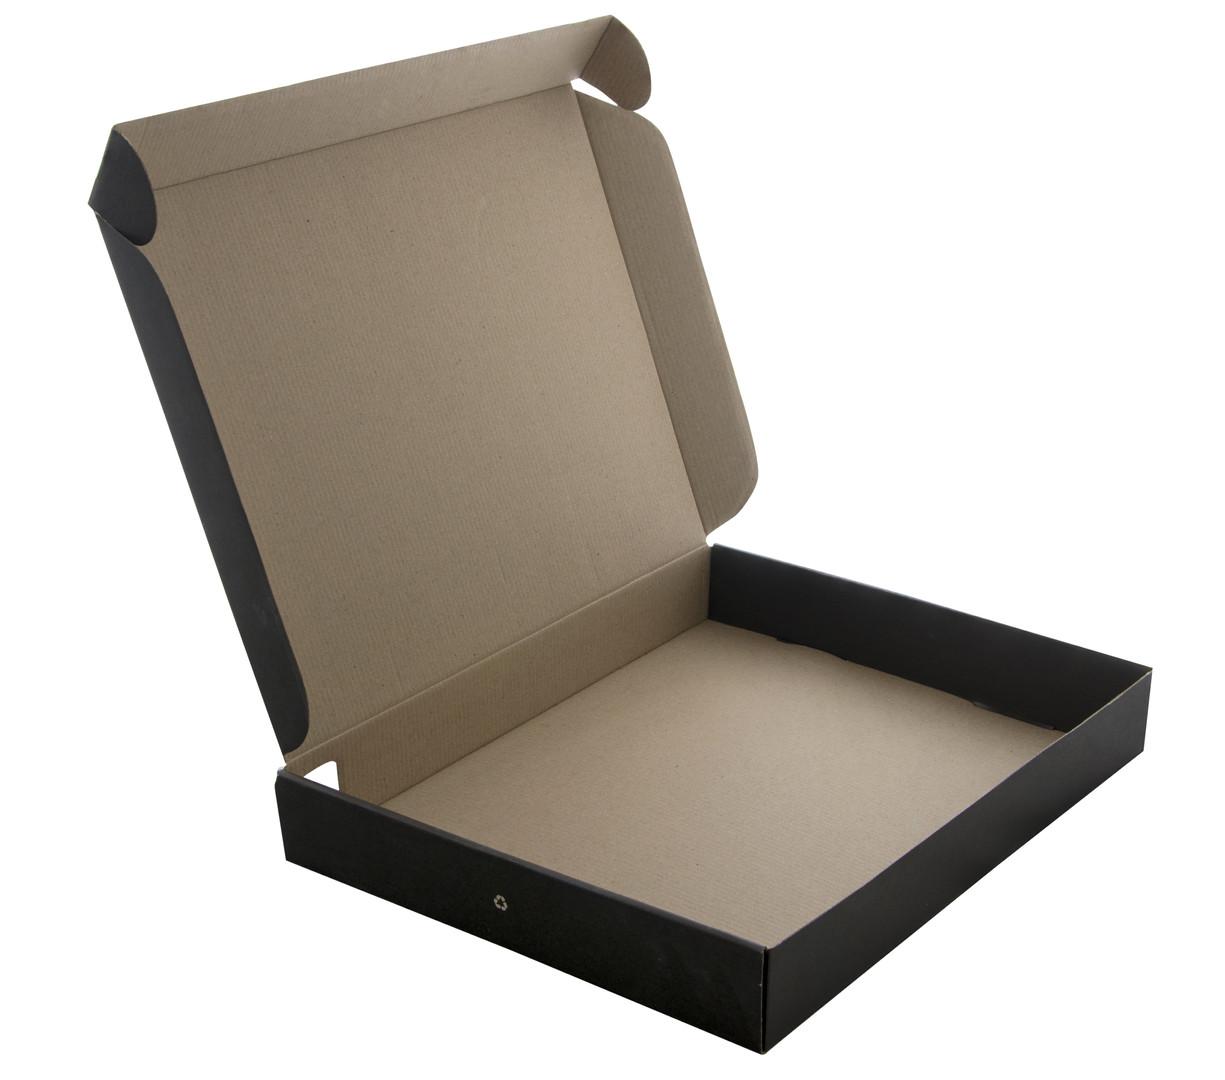 caja automontable en carton ondulado.jpe